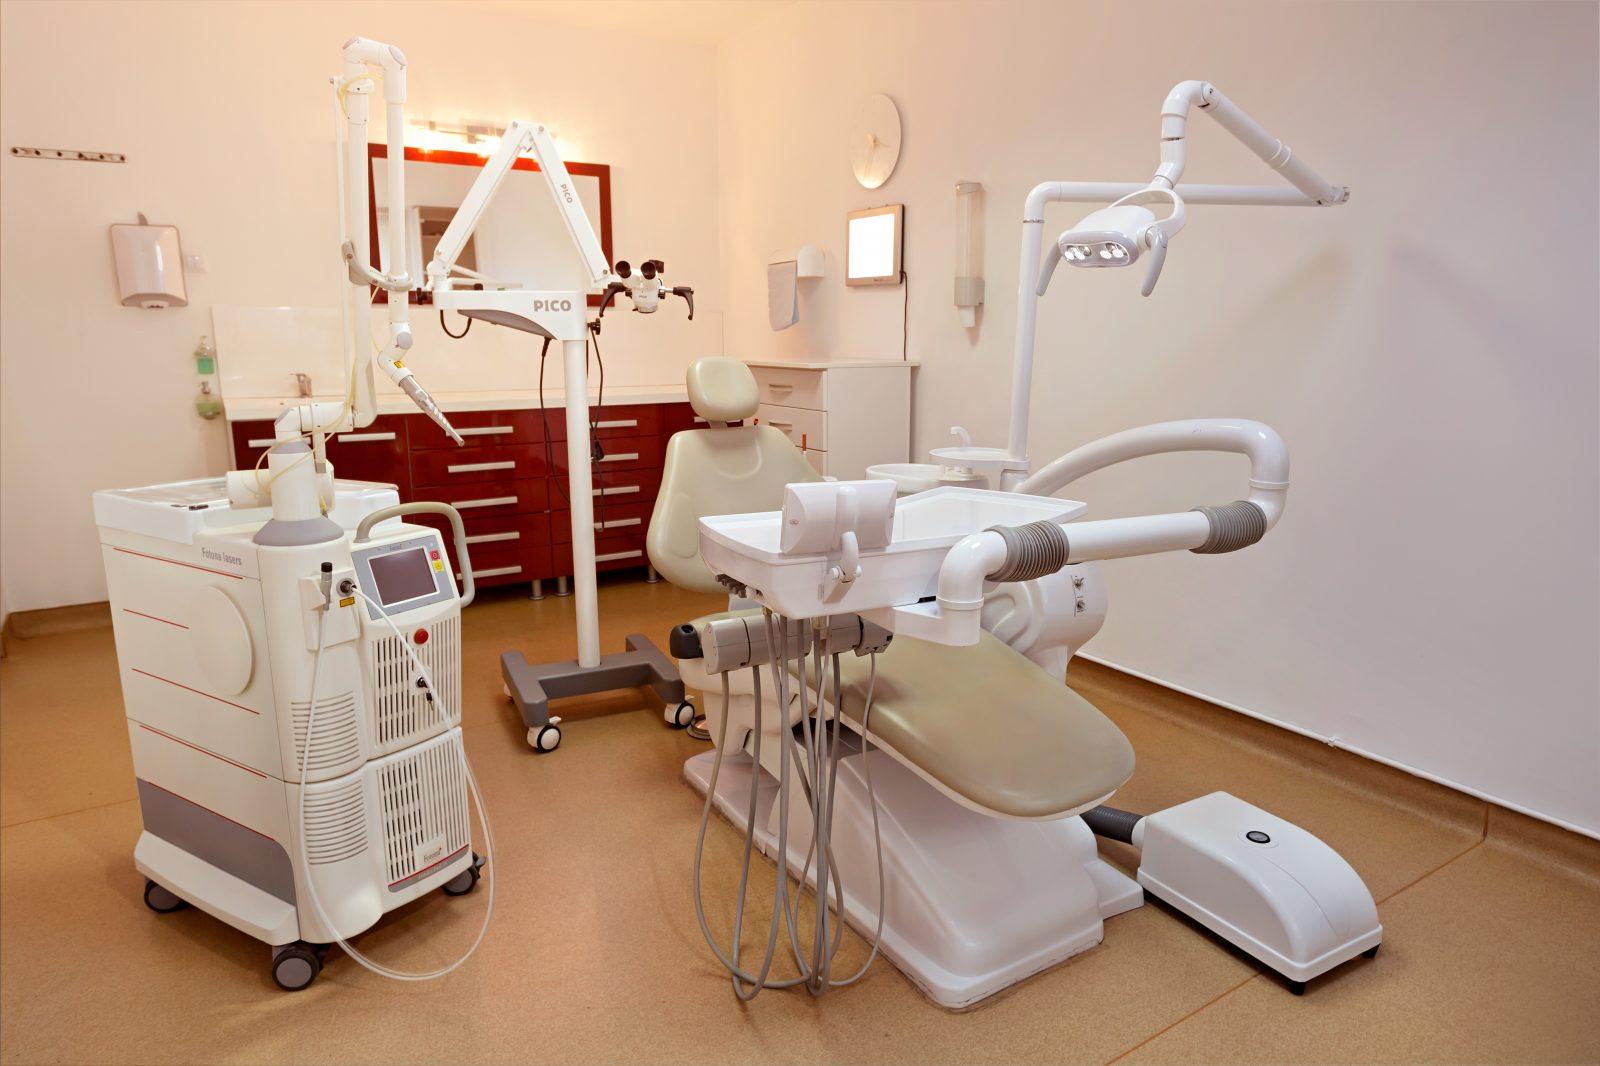 GS Clinic treatment room